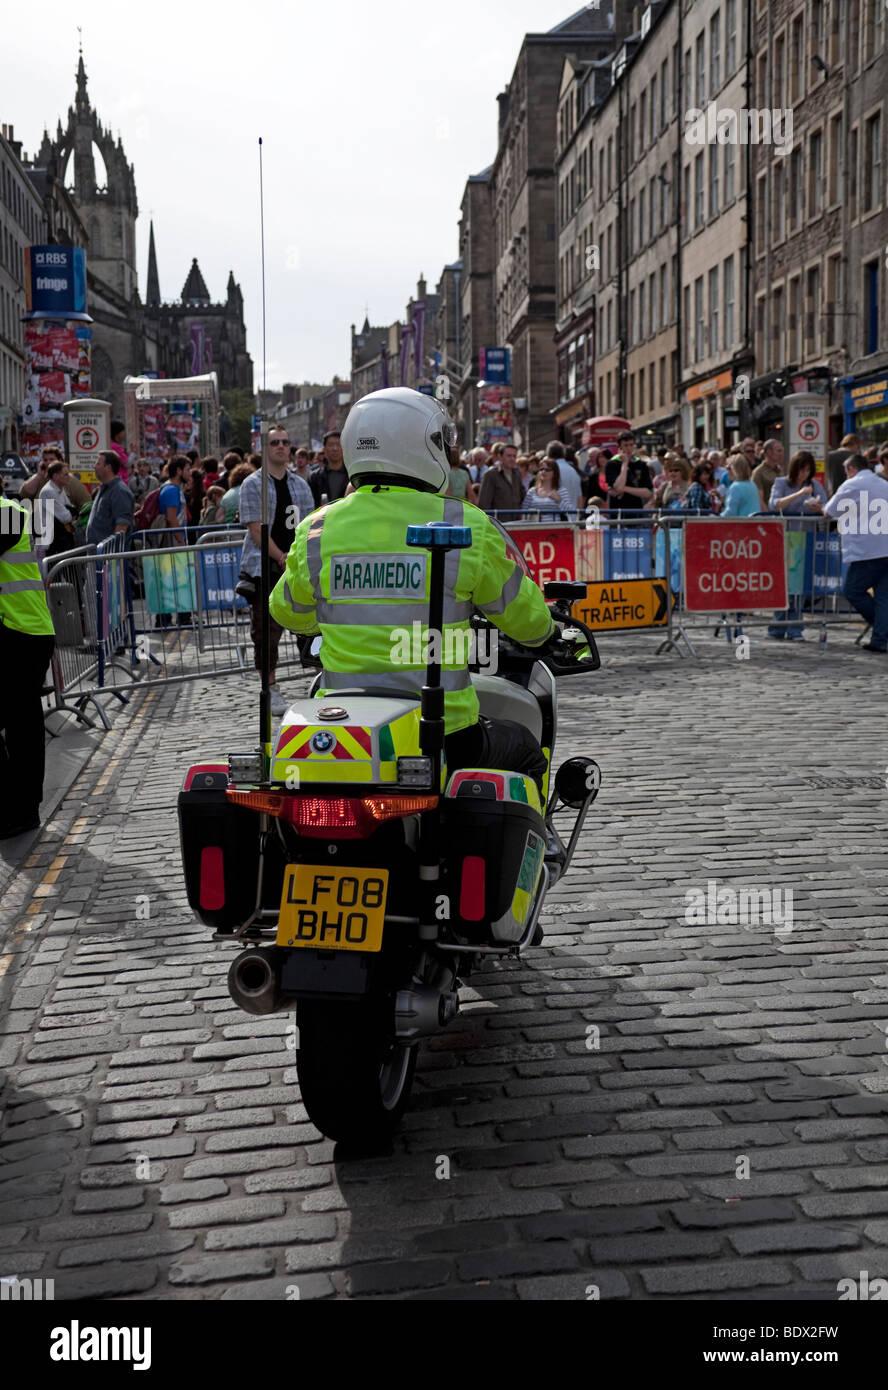 Paramedic on motorcycle, Royal Mile Edinburgh, Scotland - Stock Image